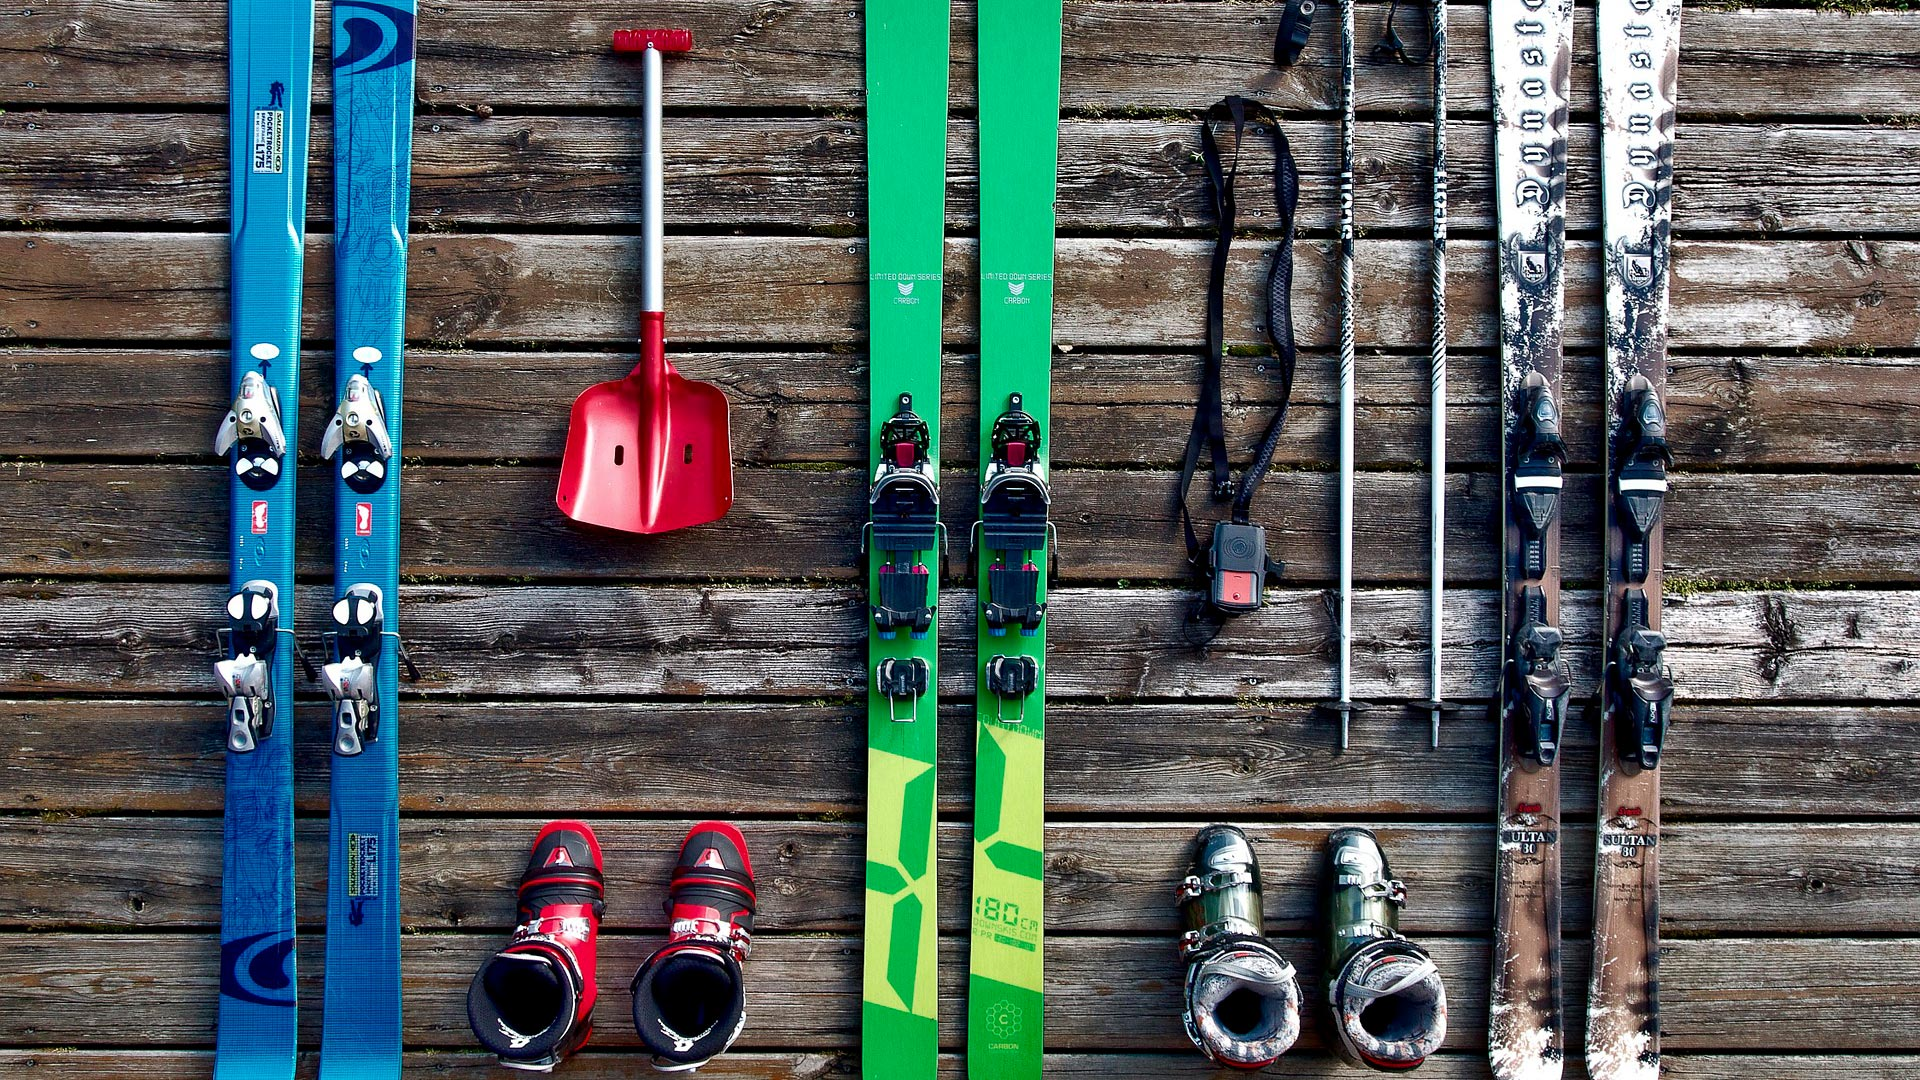 Inchirieri Echipament Ski Brasov